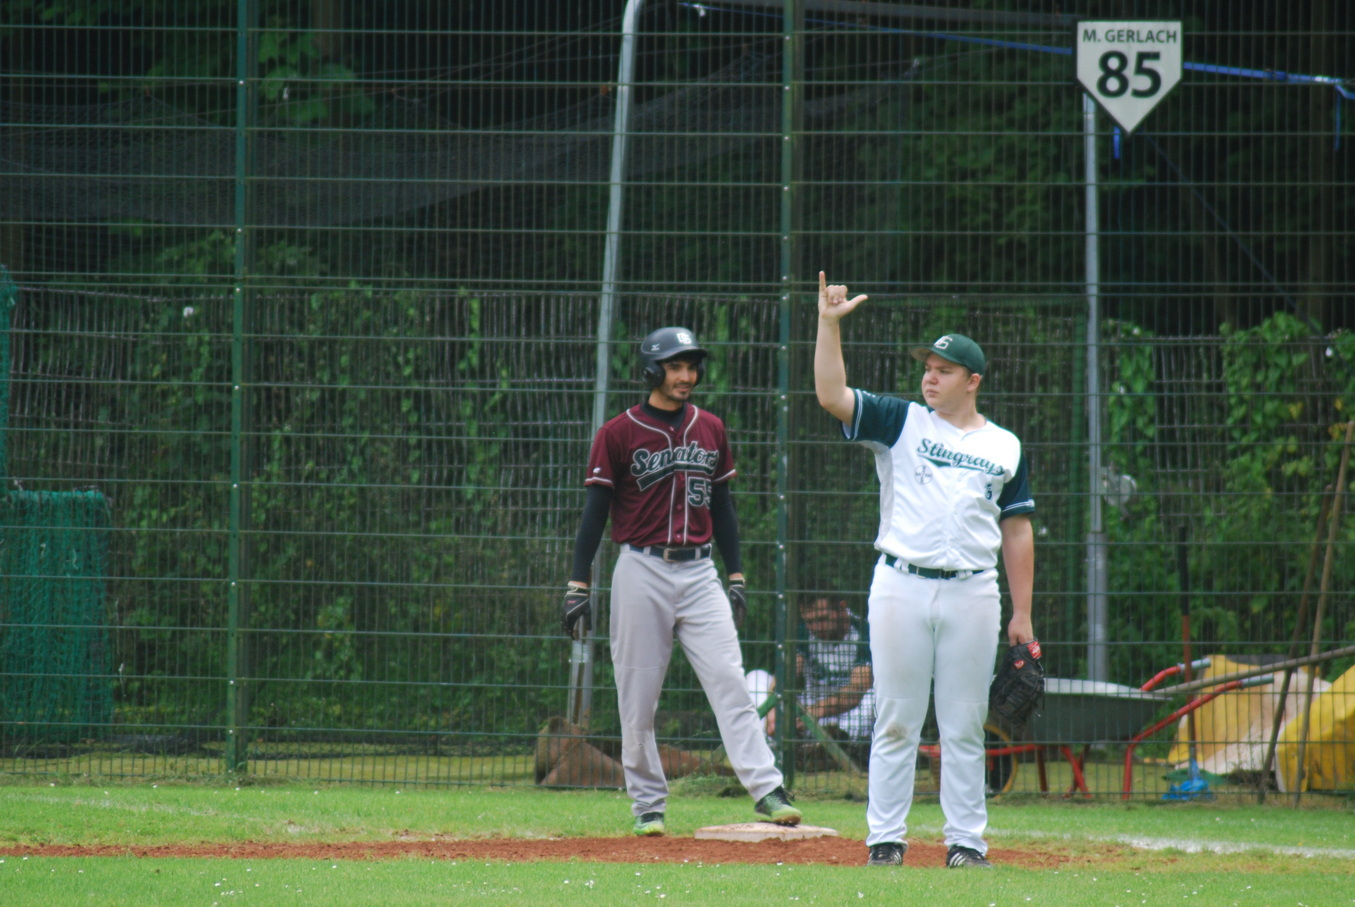 Wuppertal Stingrays vs Duesseldorf Senators 08.08.2021